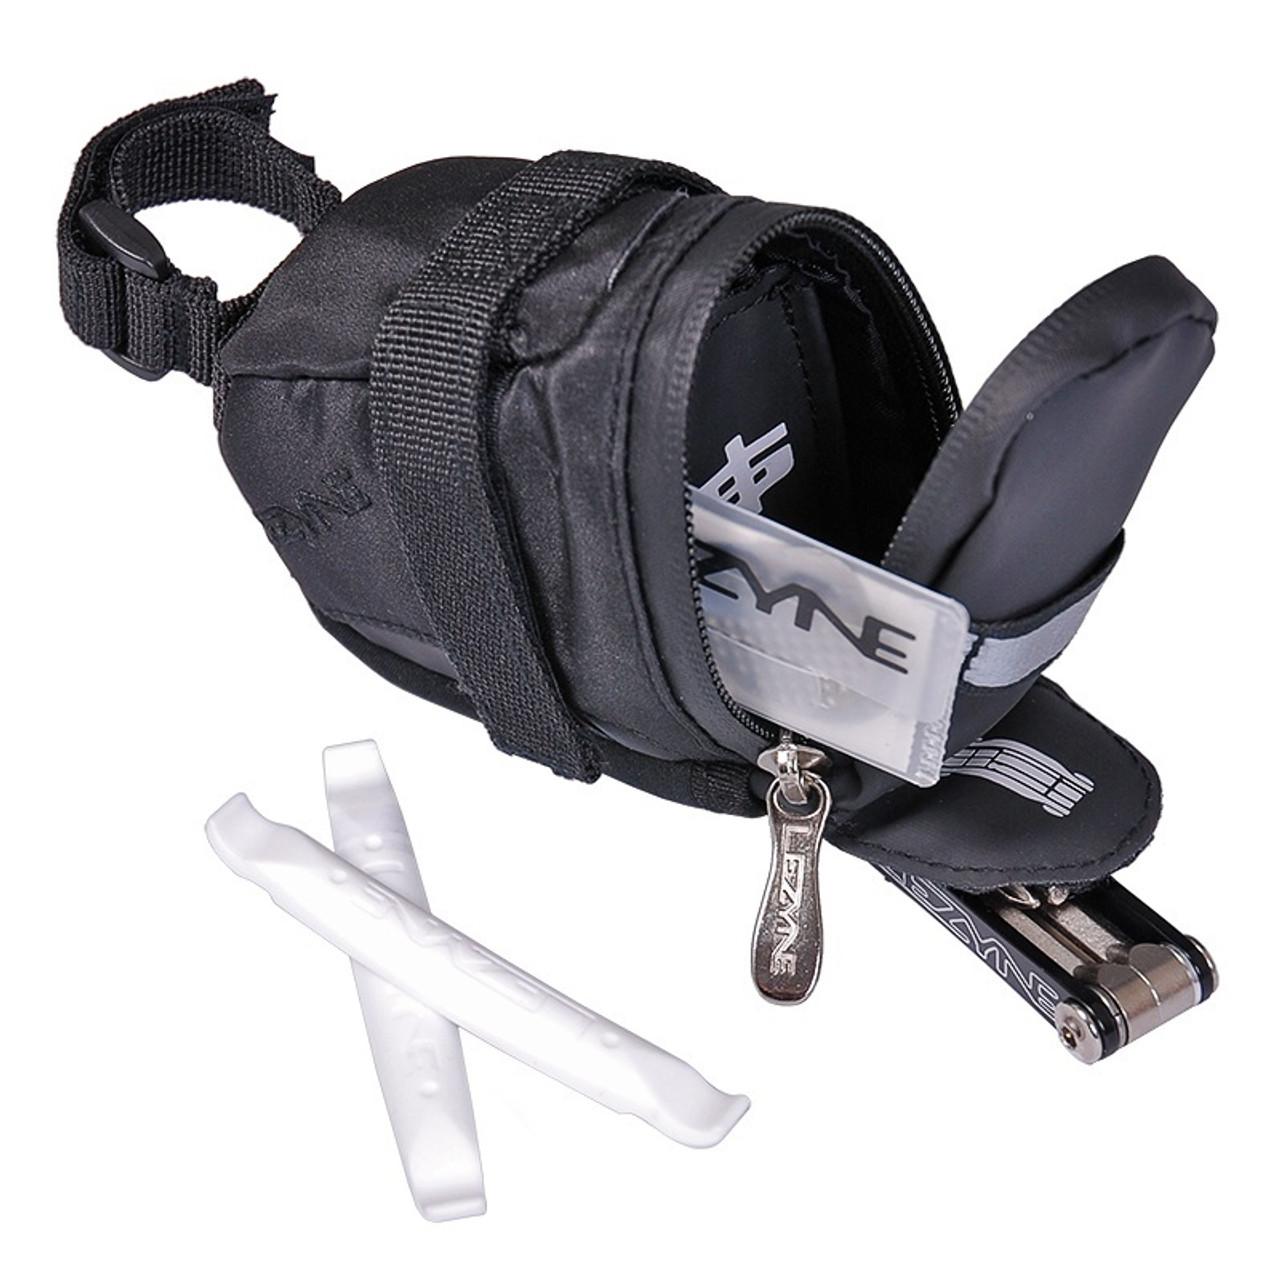 Lezyne S-Caddy Loaded Saddle Bag In Black